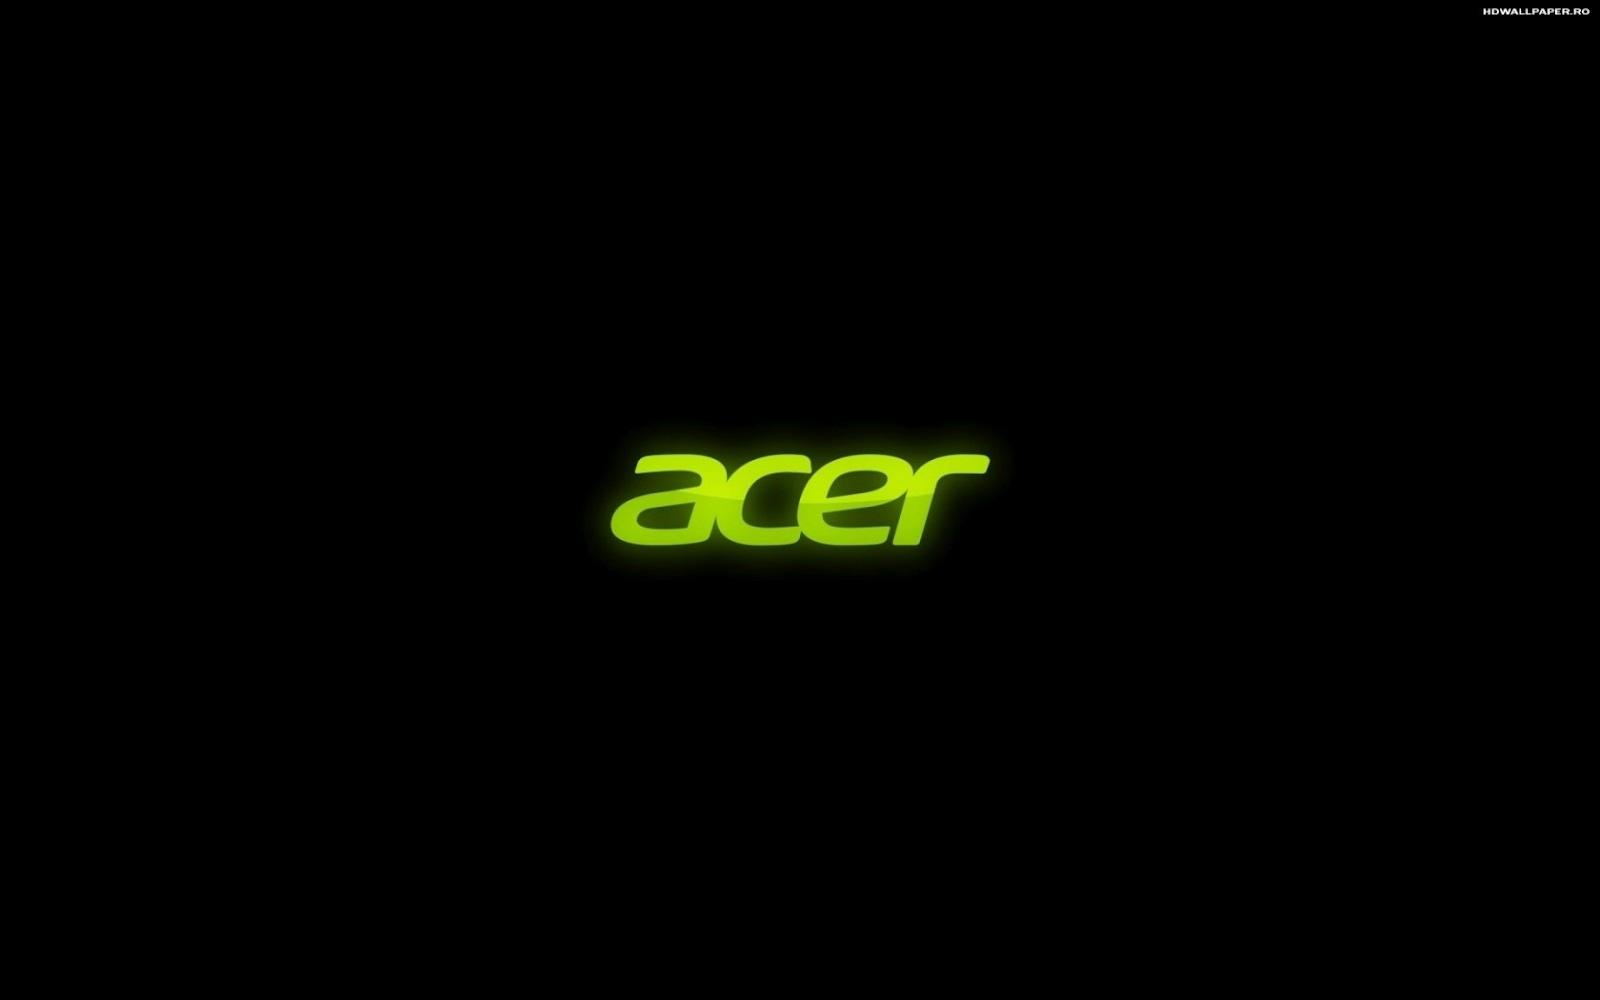 Acer Logo 3D HD Wallpaper: www.coolhd-wallpapers.com/2012/04/acer-logo-3d-hd-wallpaper.html